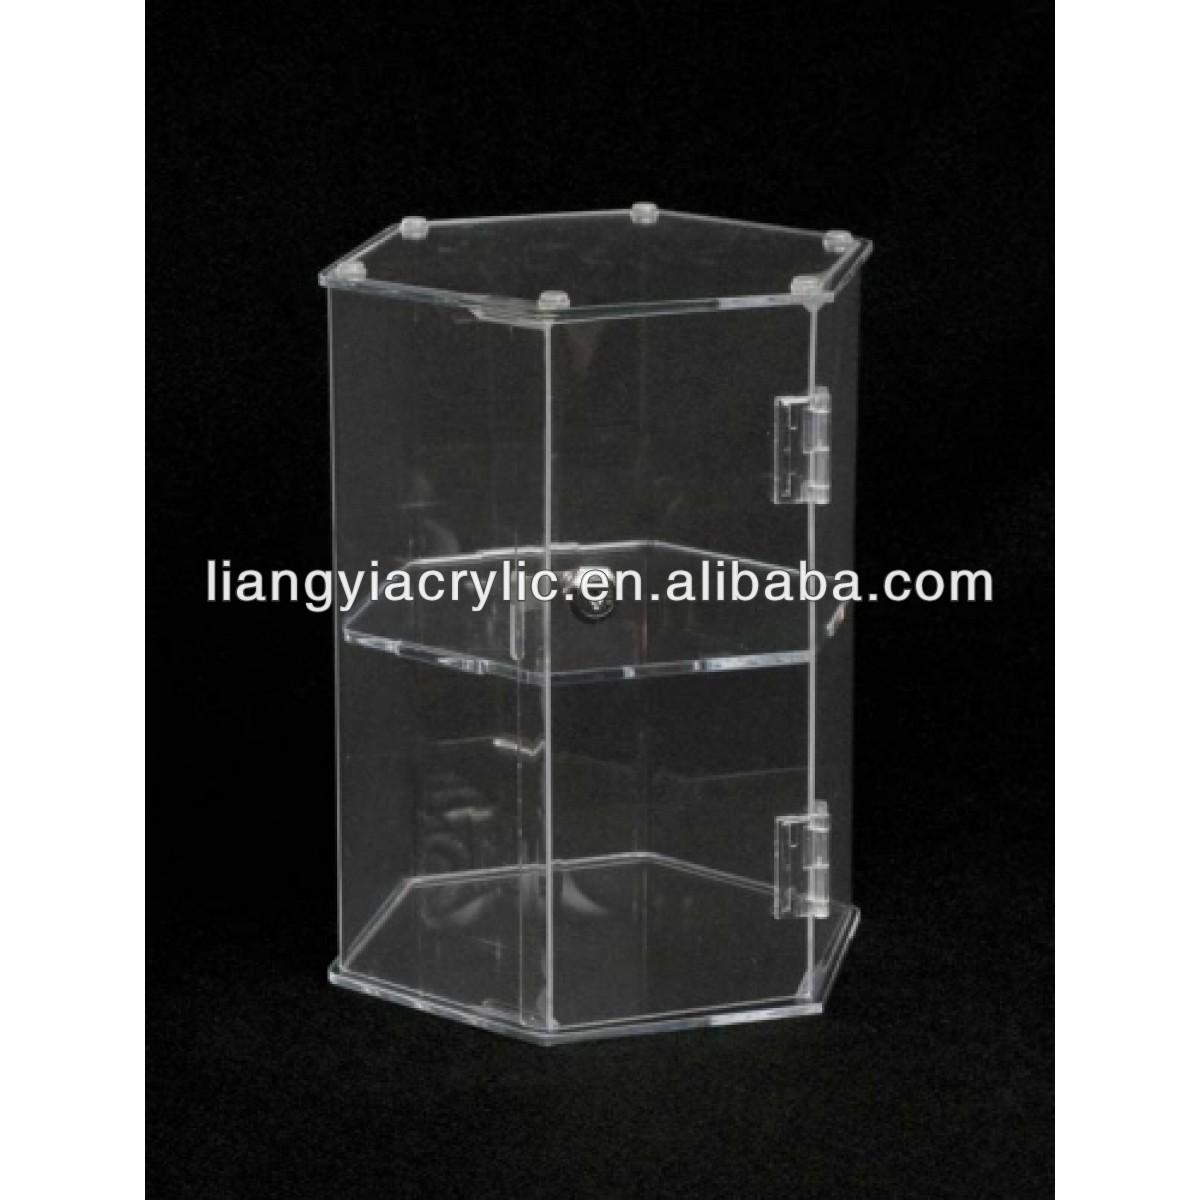 Acrylic Countertop Bakery Display Case, Acrylic Countertop Bakery ...